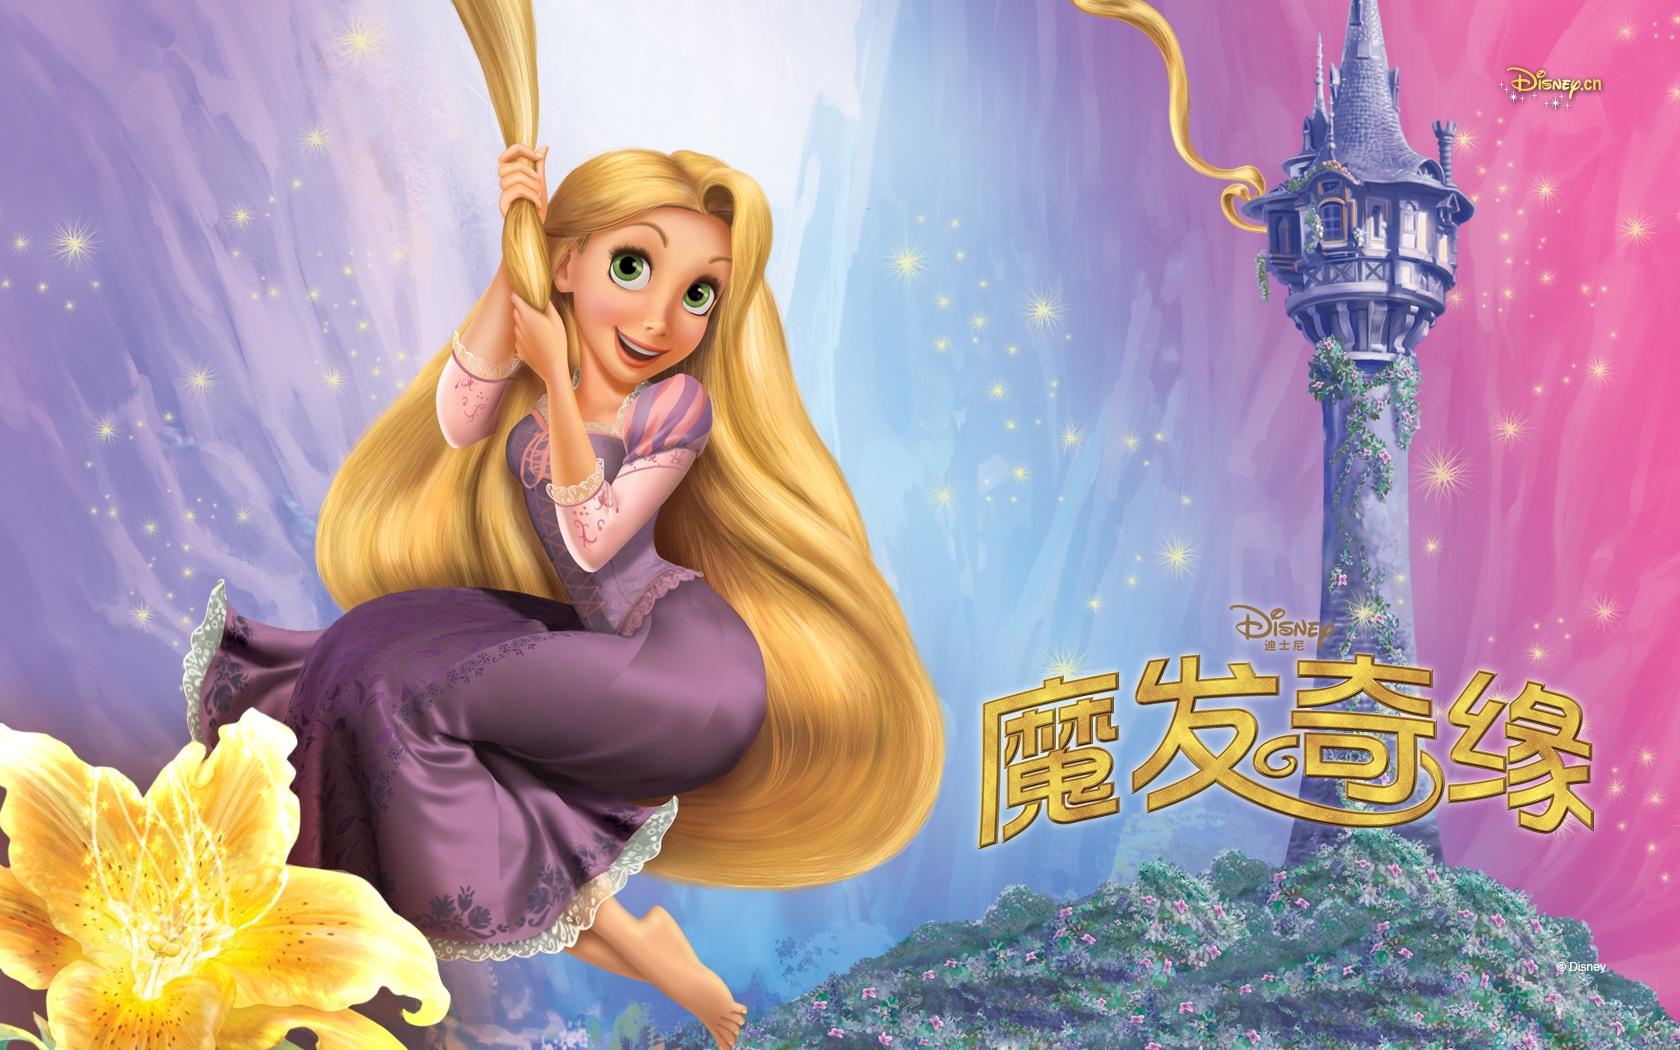 Wallpaper Beautiful Long Hair Princess 1680x1050 Hd Picture